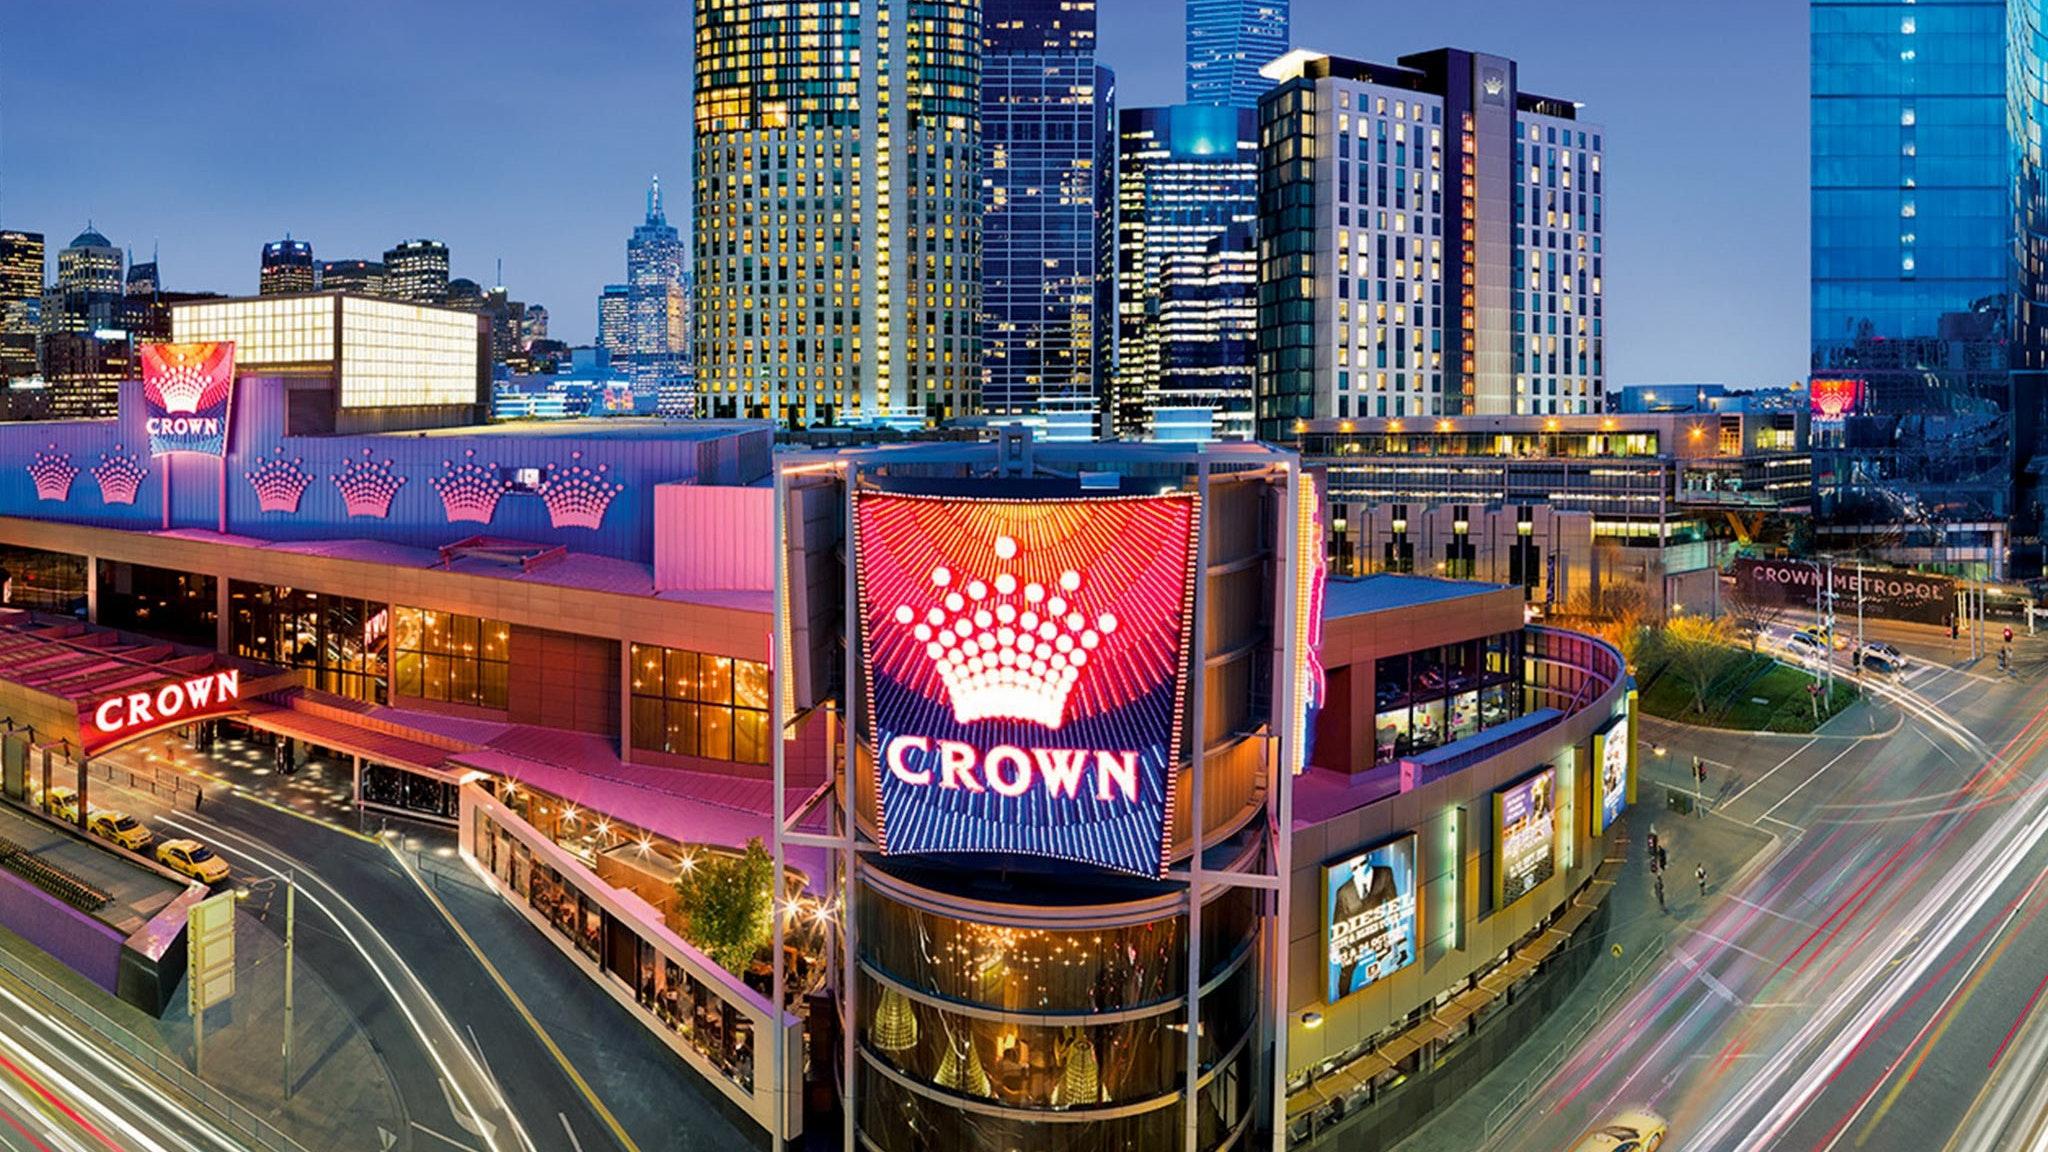 Crown casino shows vegas joker casino download